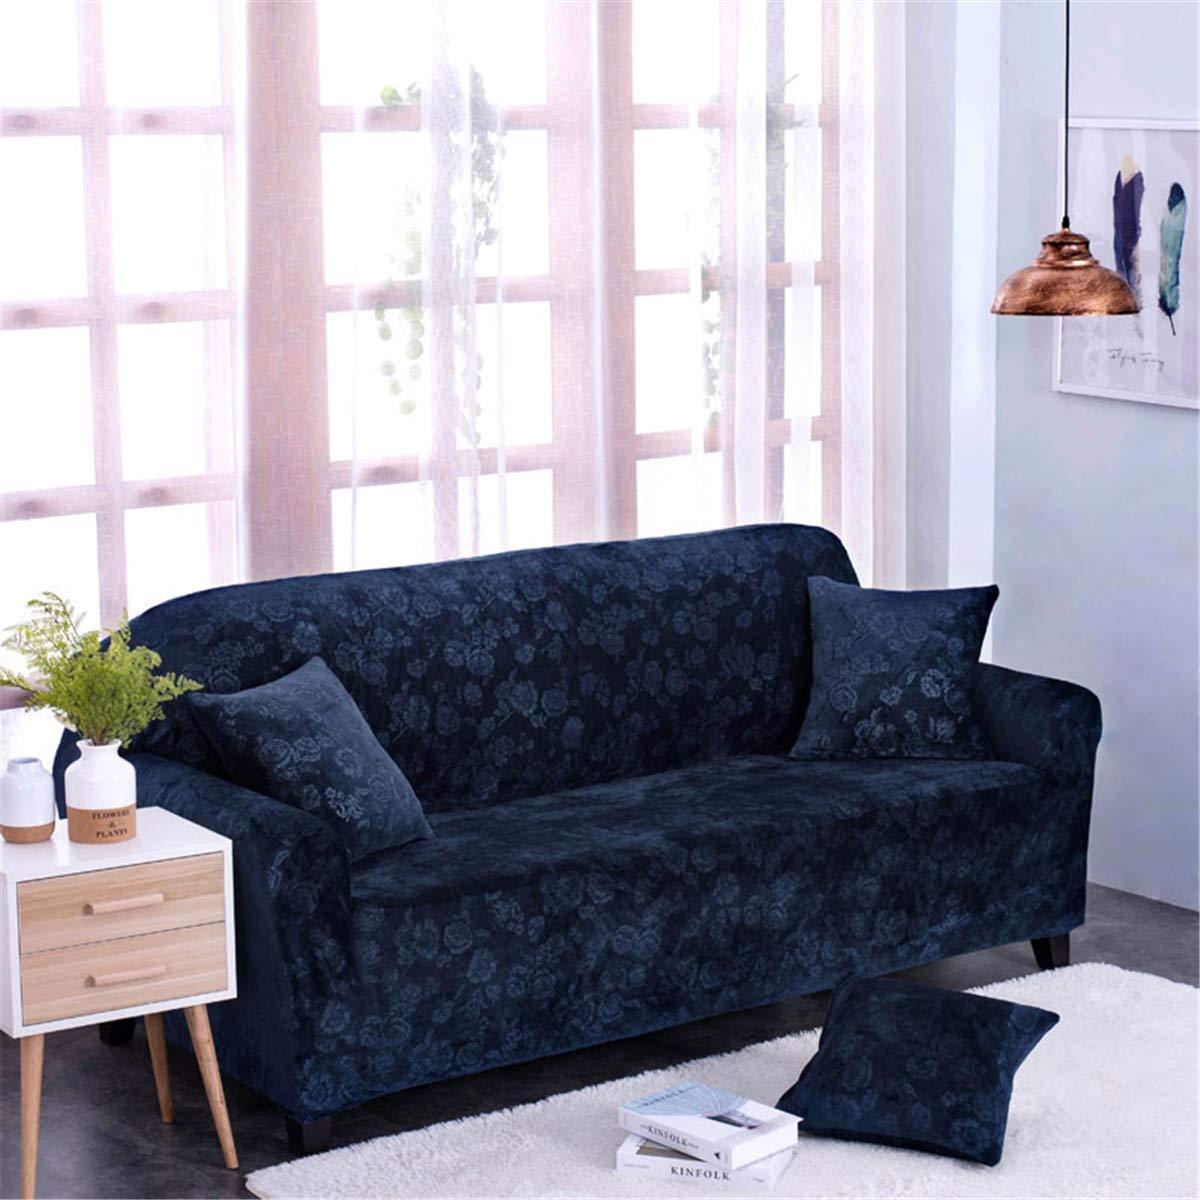 Tremendous Qiao Elastic Sofa Bed Set European Style Simple Sofa Cover Download Free Architecture Designs Scobabritishbridgeorg